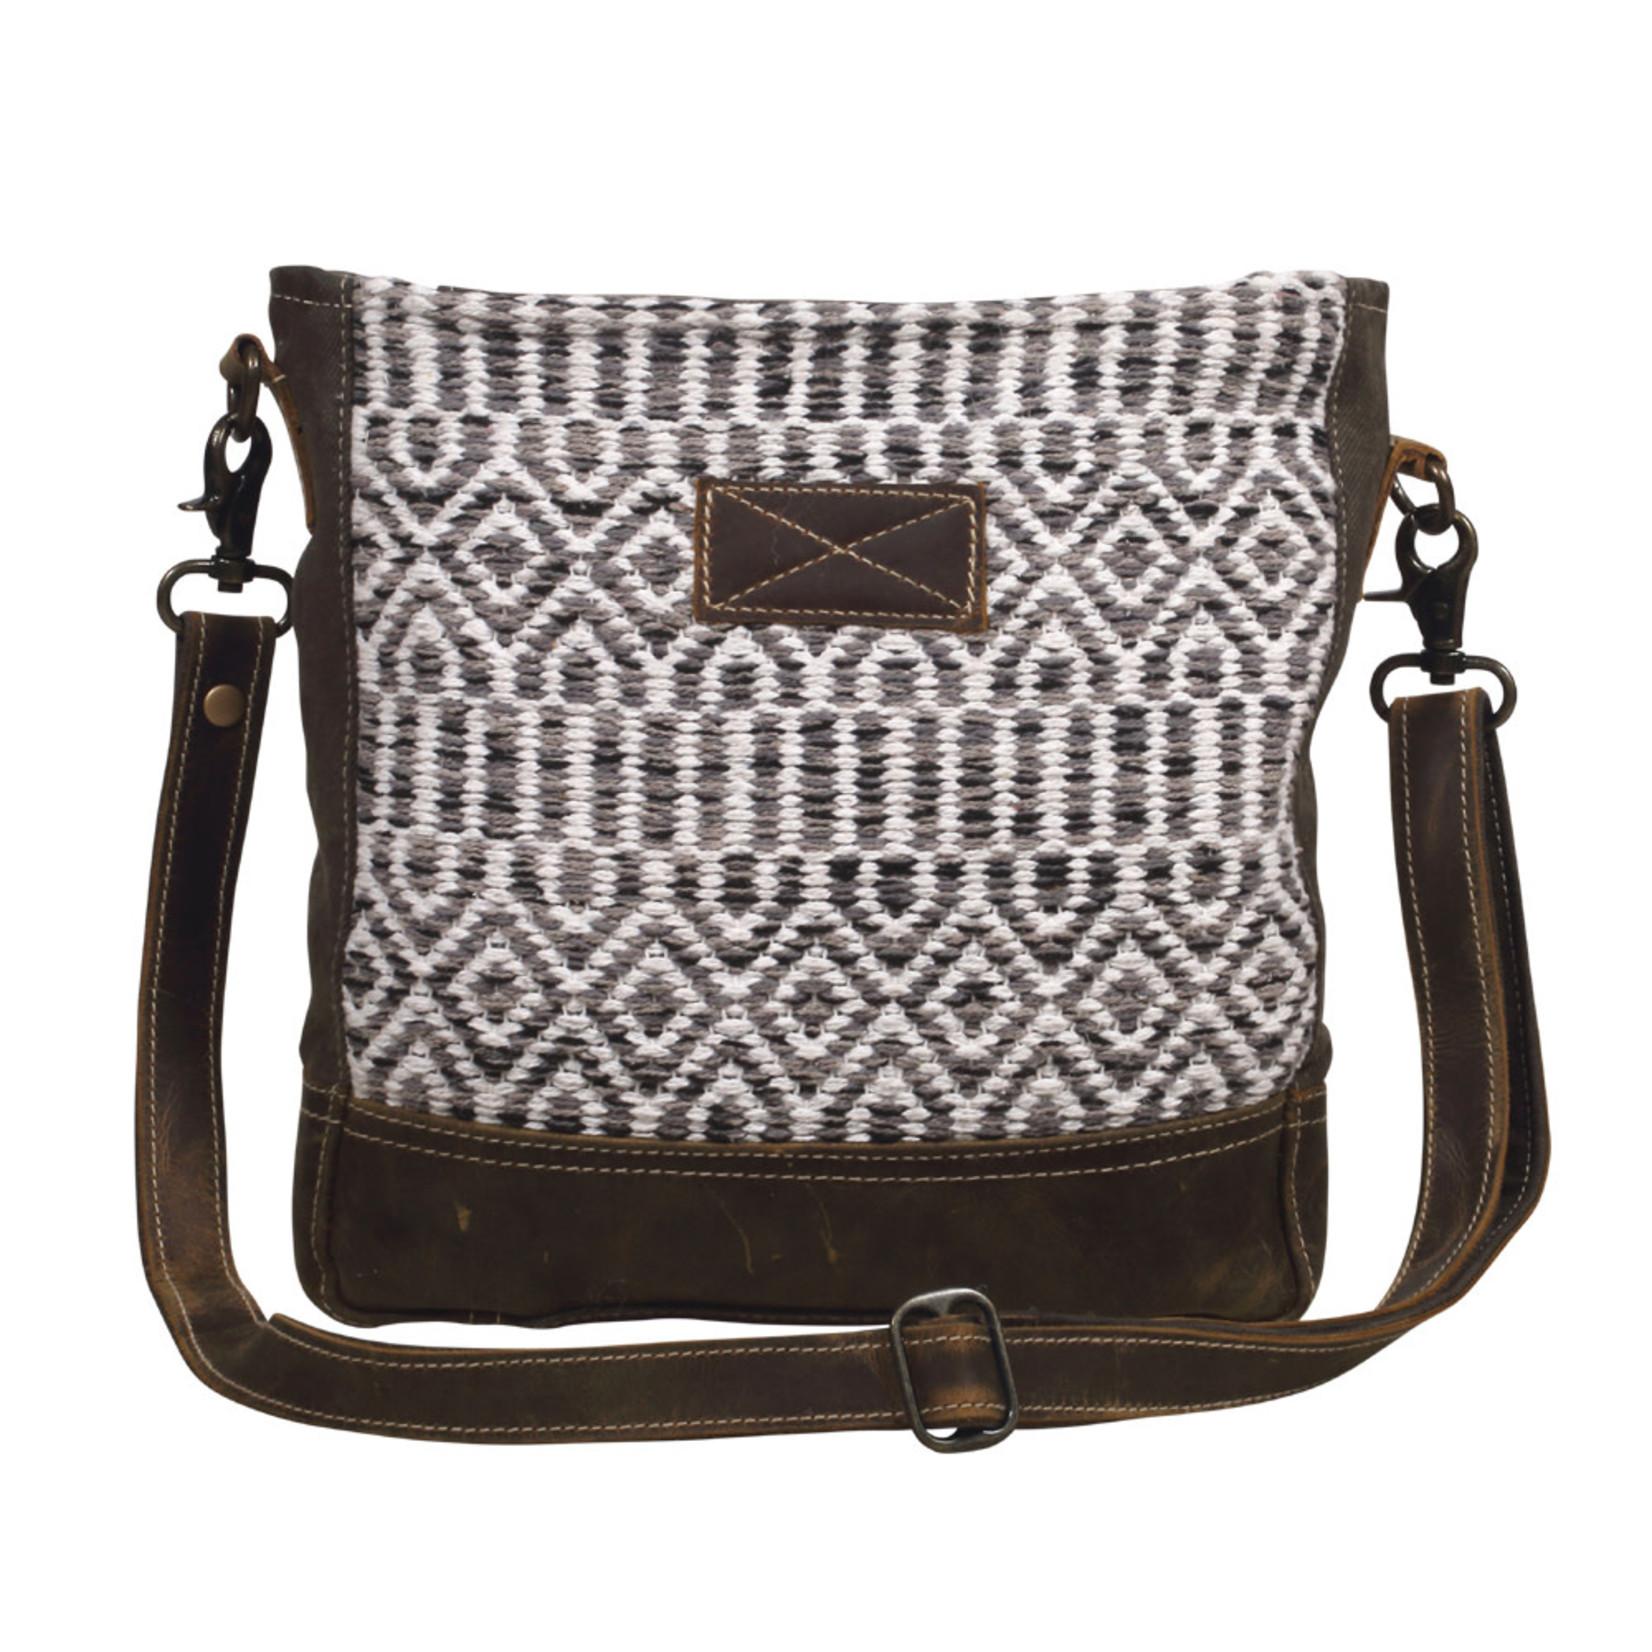 Myra Bags S-2037 Elfin Shoulder Bag